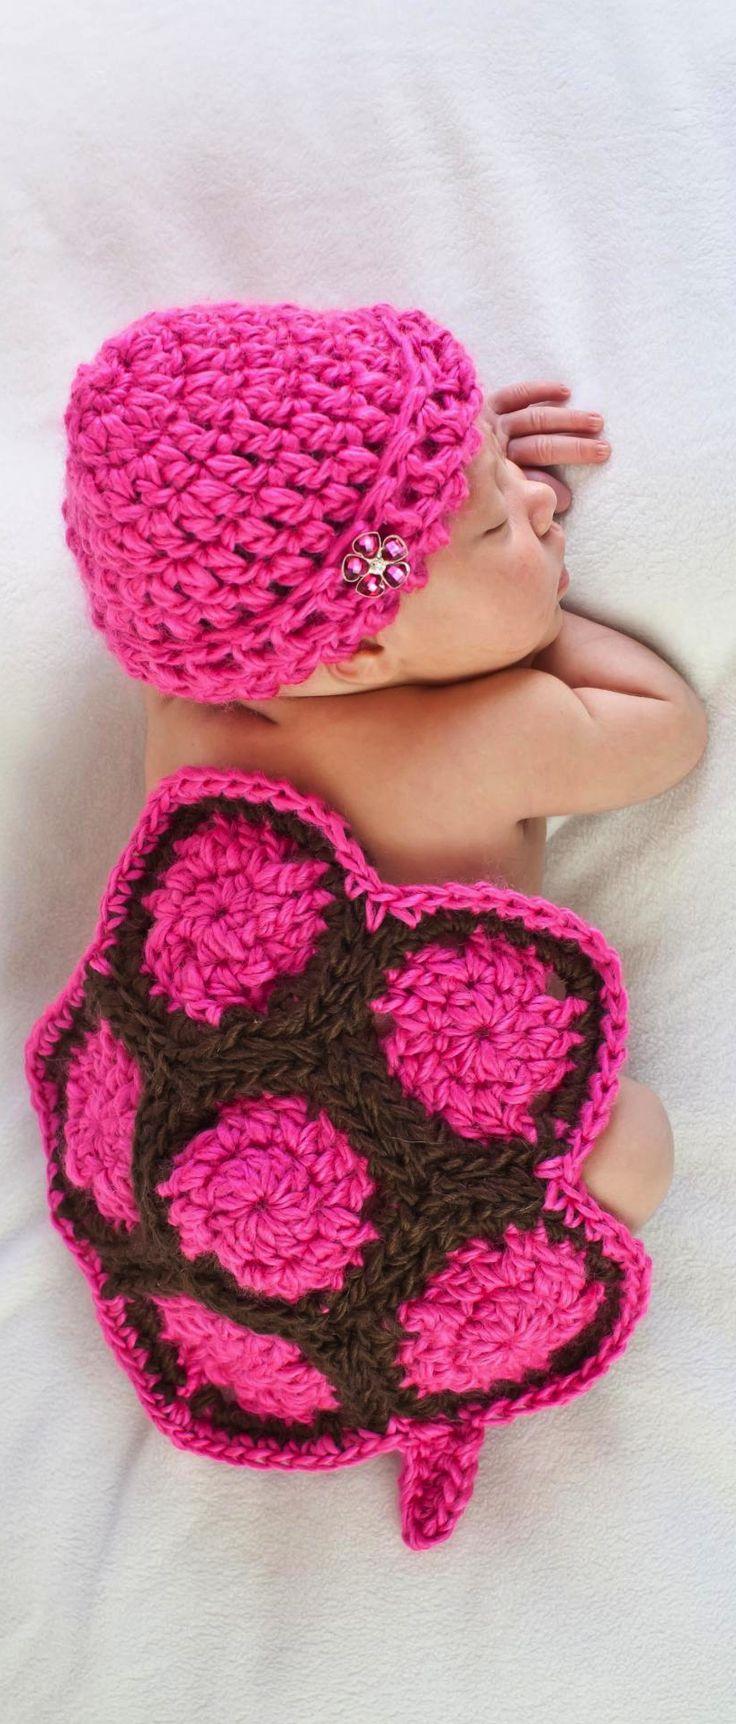 Free Crochet Pattern For Turtle Photo Prop : 17 Best ideas about Crochet Turtle on Pinterest Crochet ...